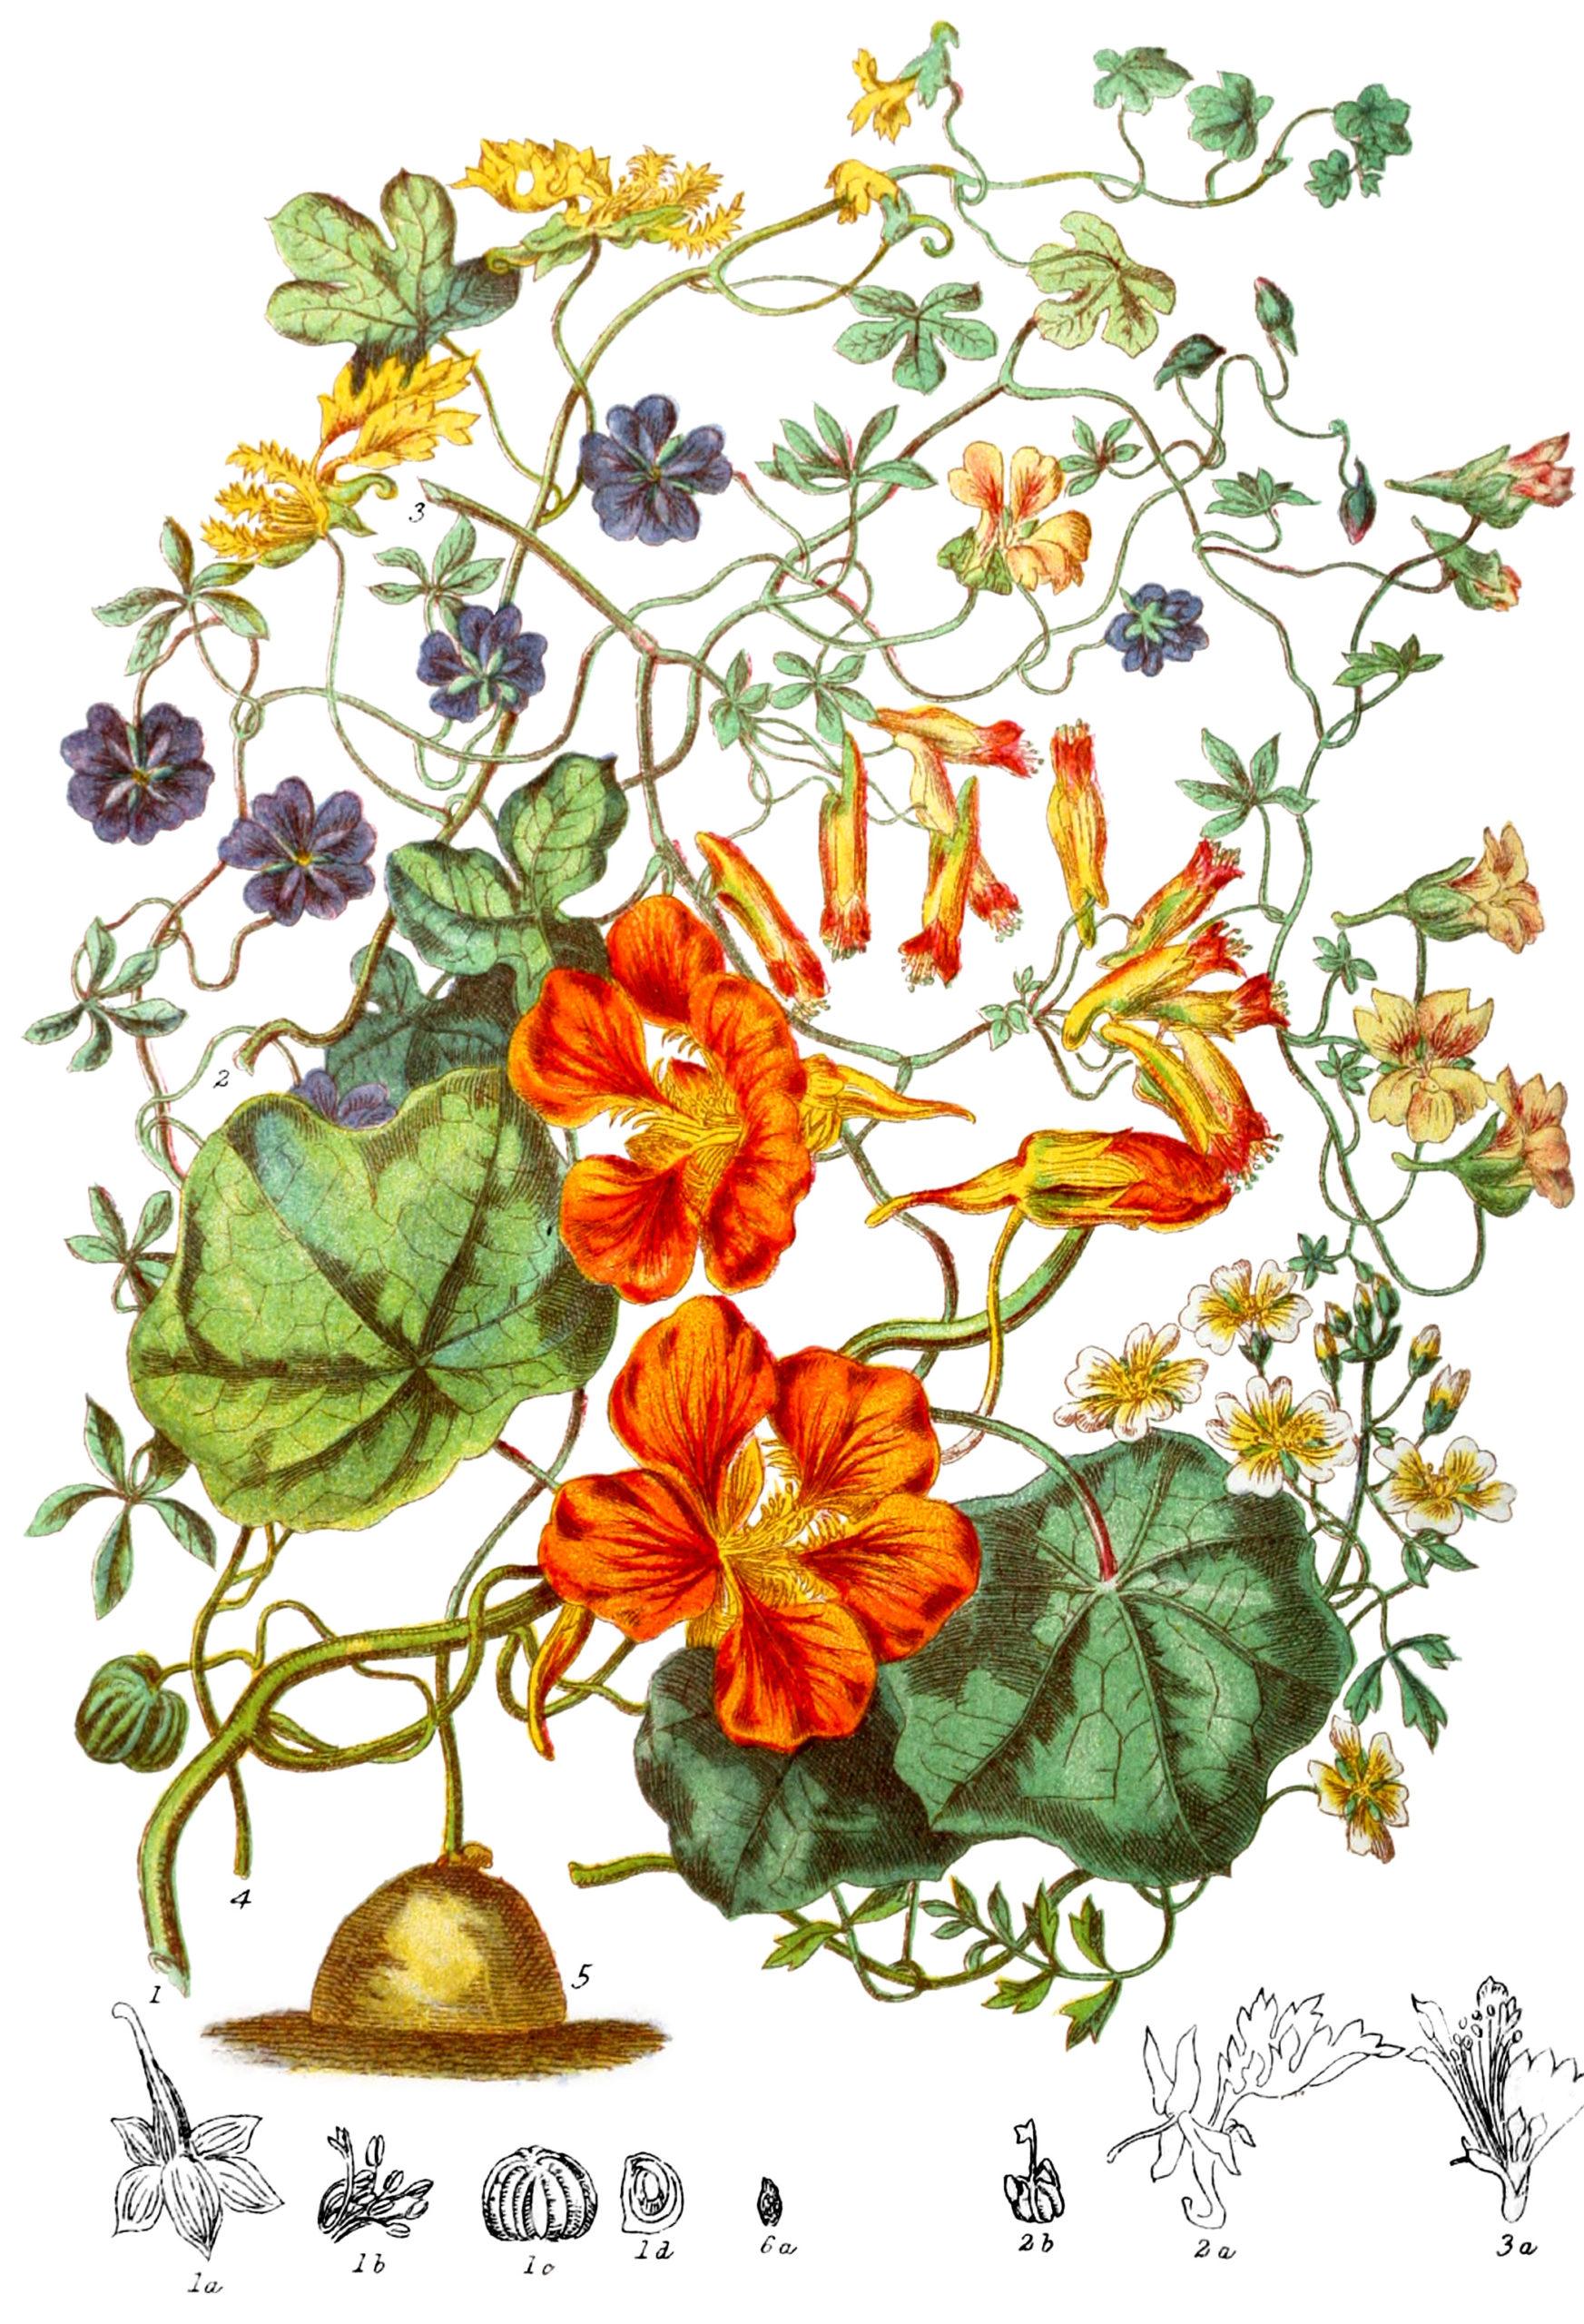 ropæolaceæ: The Indian Cress, Or Nasturtium Tribe (1868) via Illustrations Of The Natural Orders Of Plants